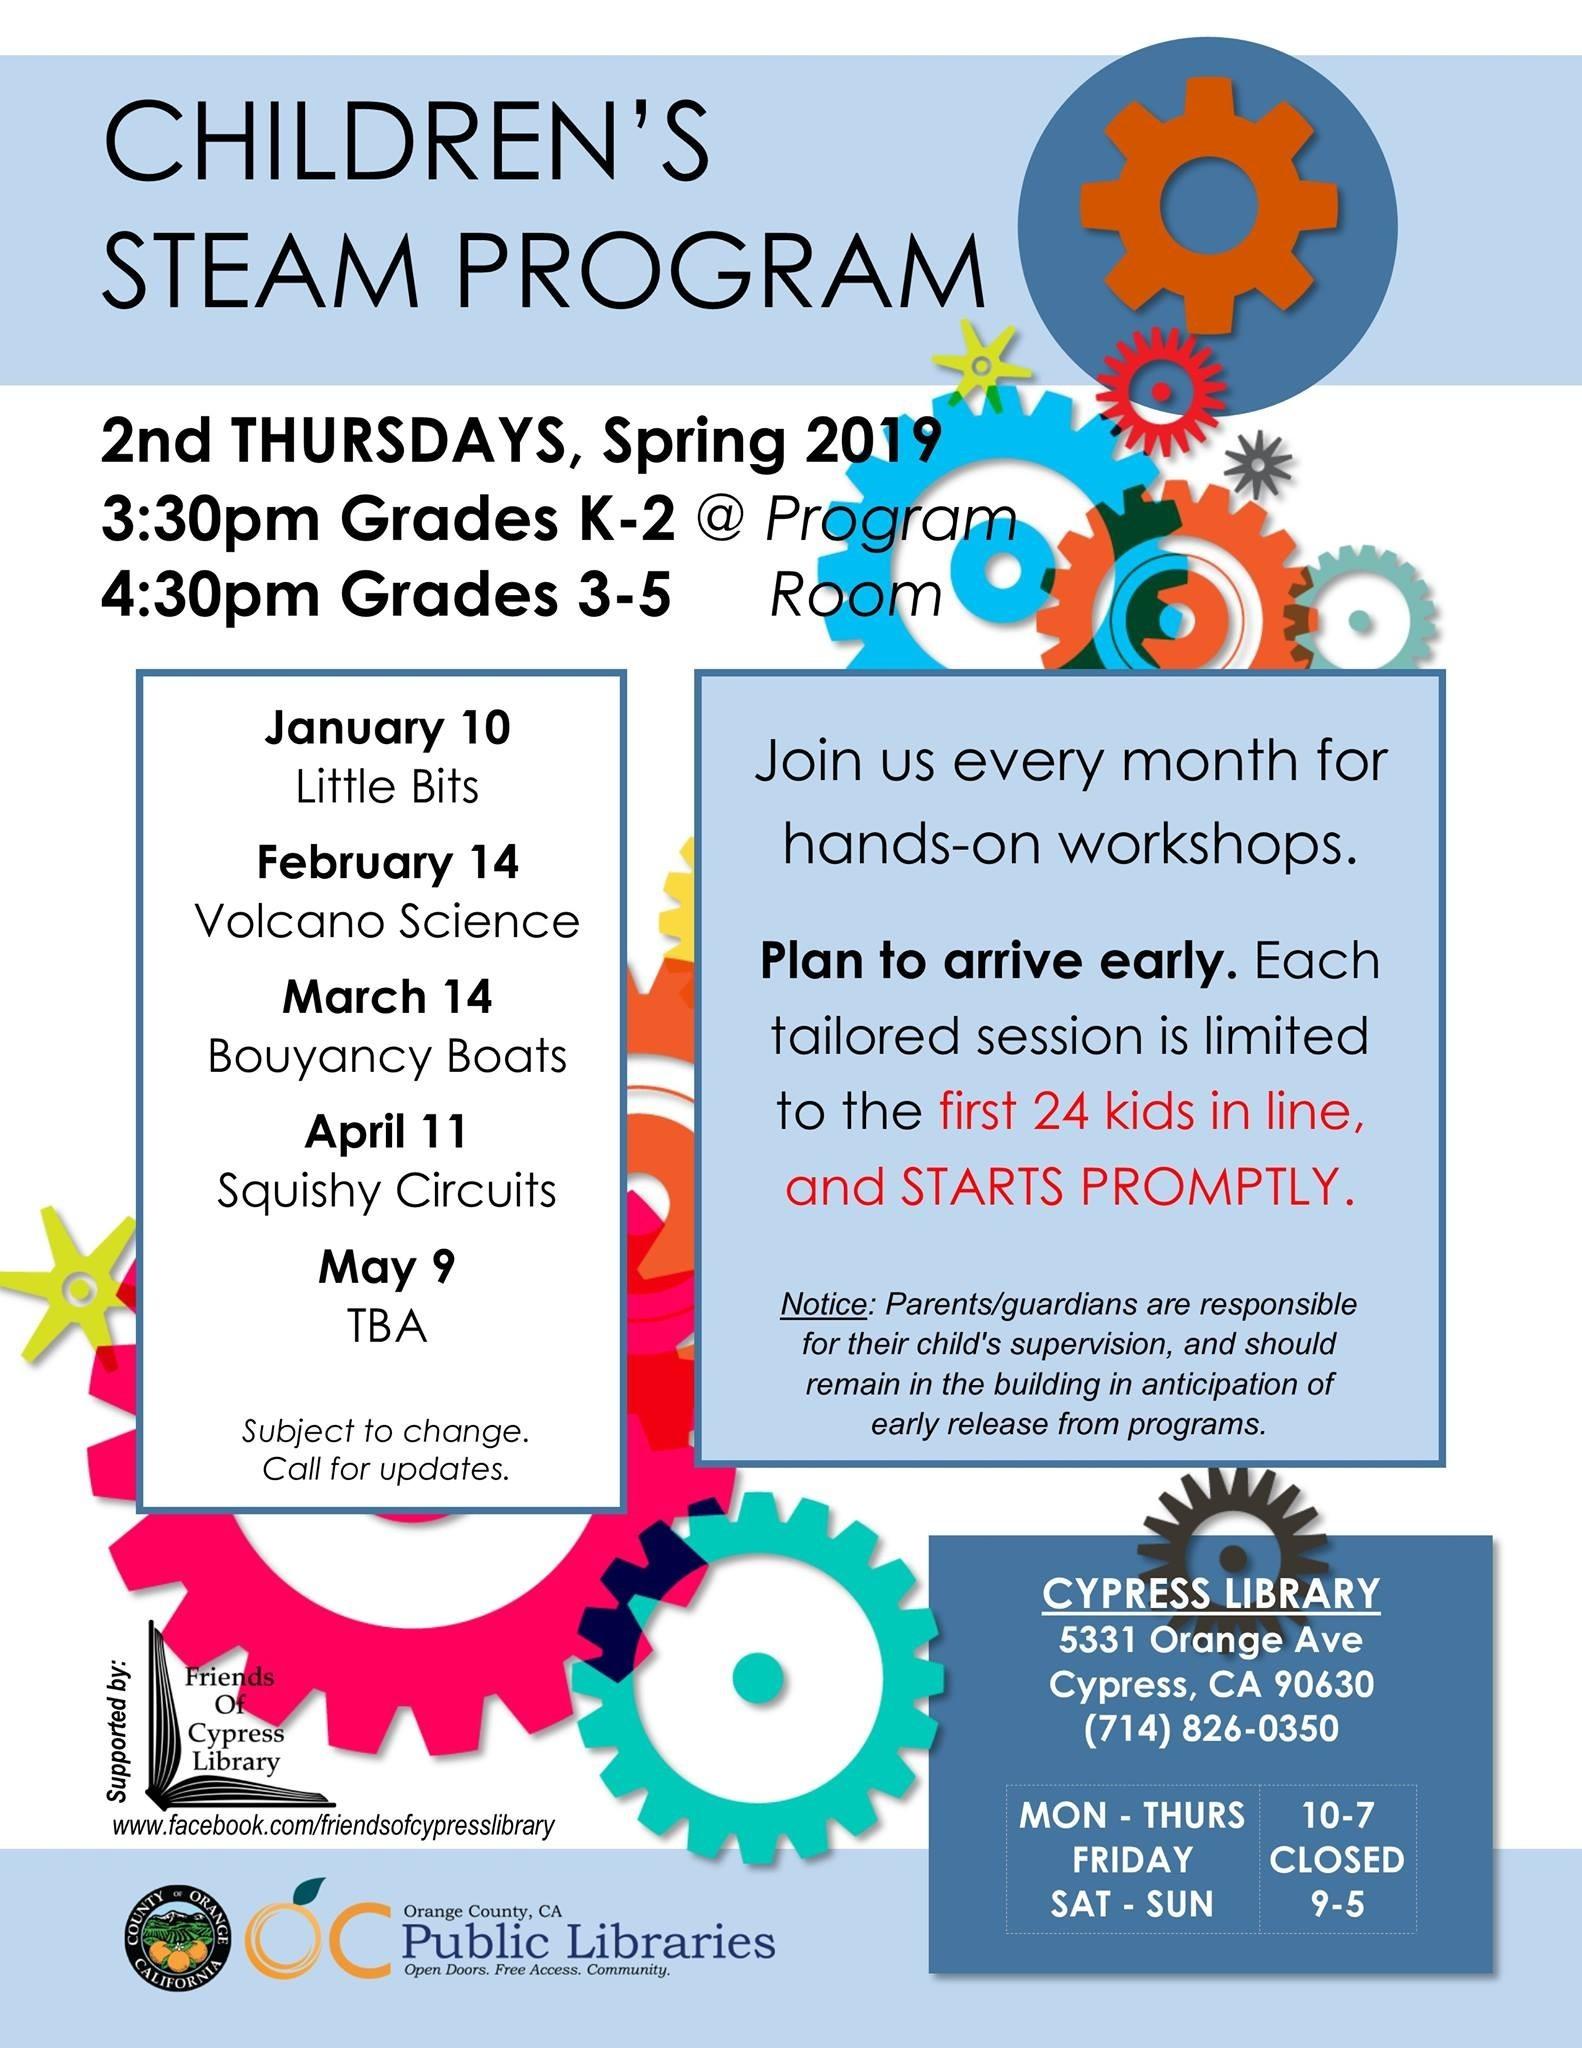 march calendar kids mas recientes steam grades k 2 cypress library los angeles 11 april of march calendar kids